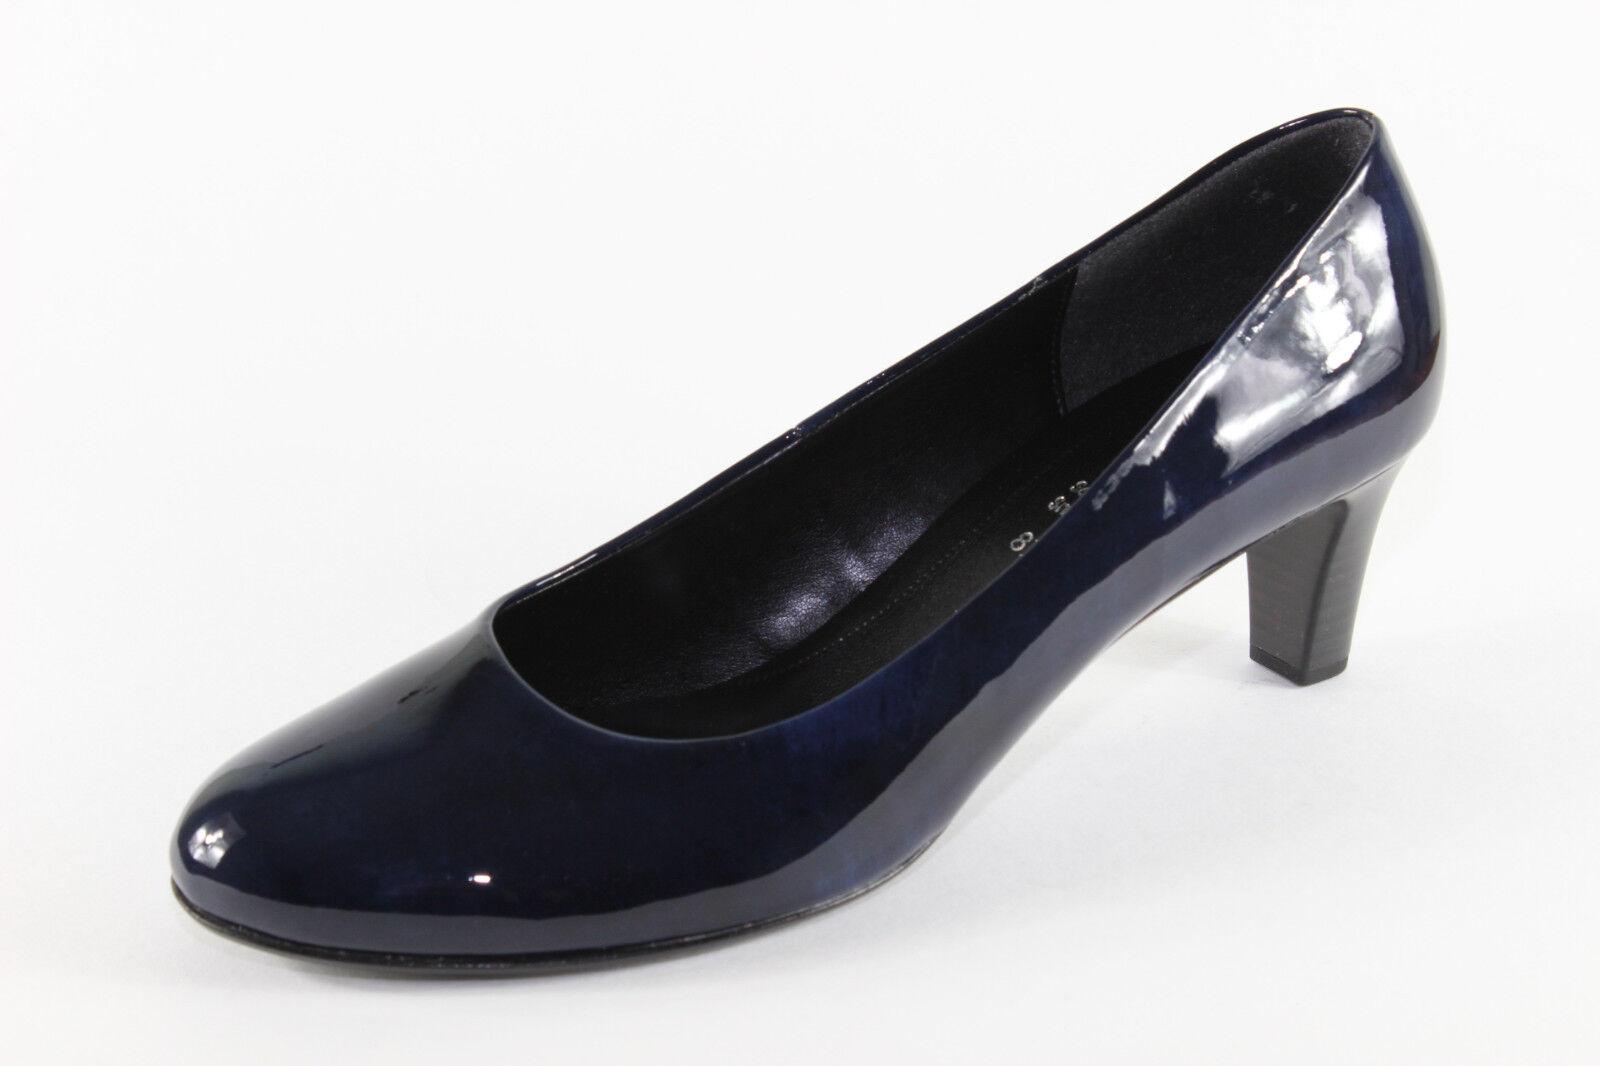 Gabor 300.76, elegante Lack-Pumps in Blau, Damenschuhe Übergröße